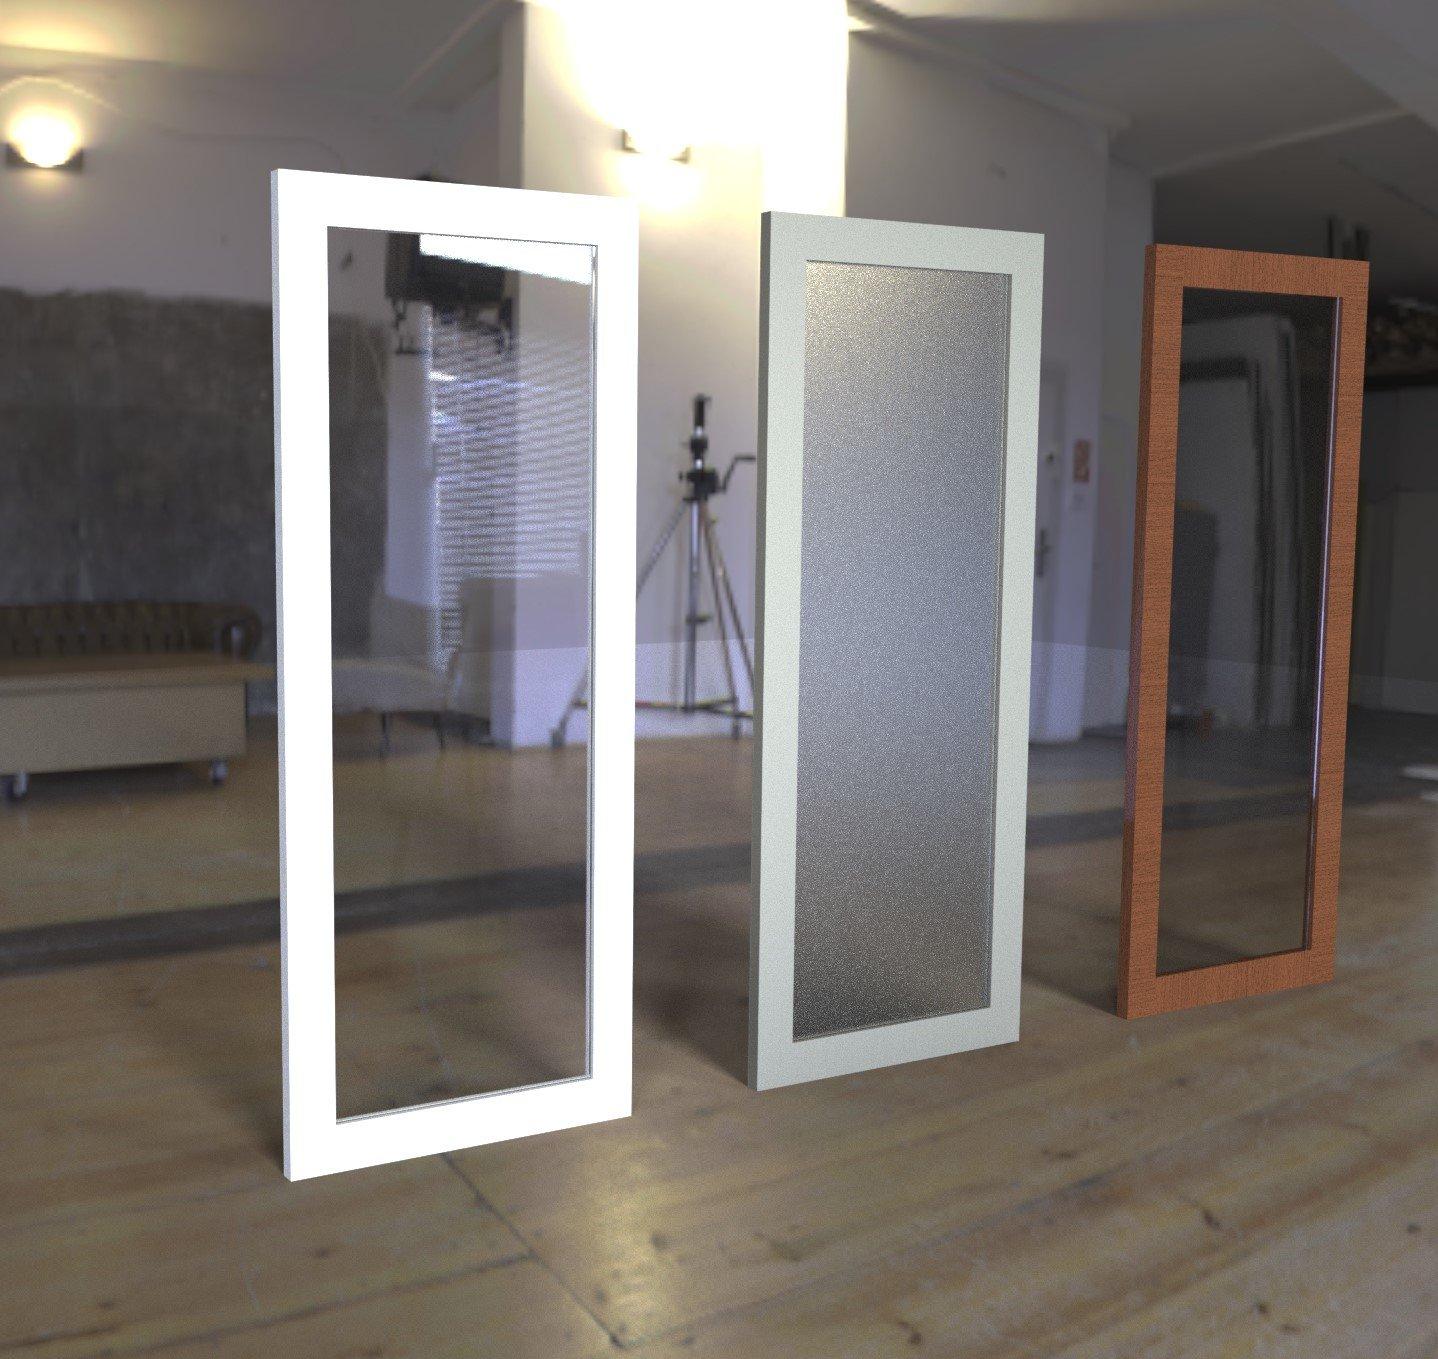 Amusing glass sliding door nsw ideas ideas house design for Aluminium sliding patio doors